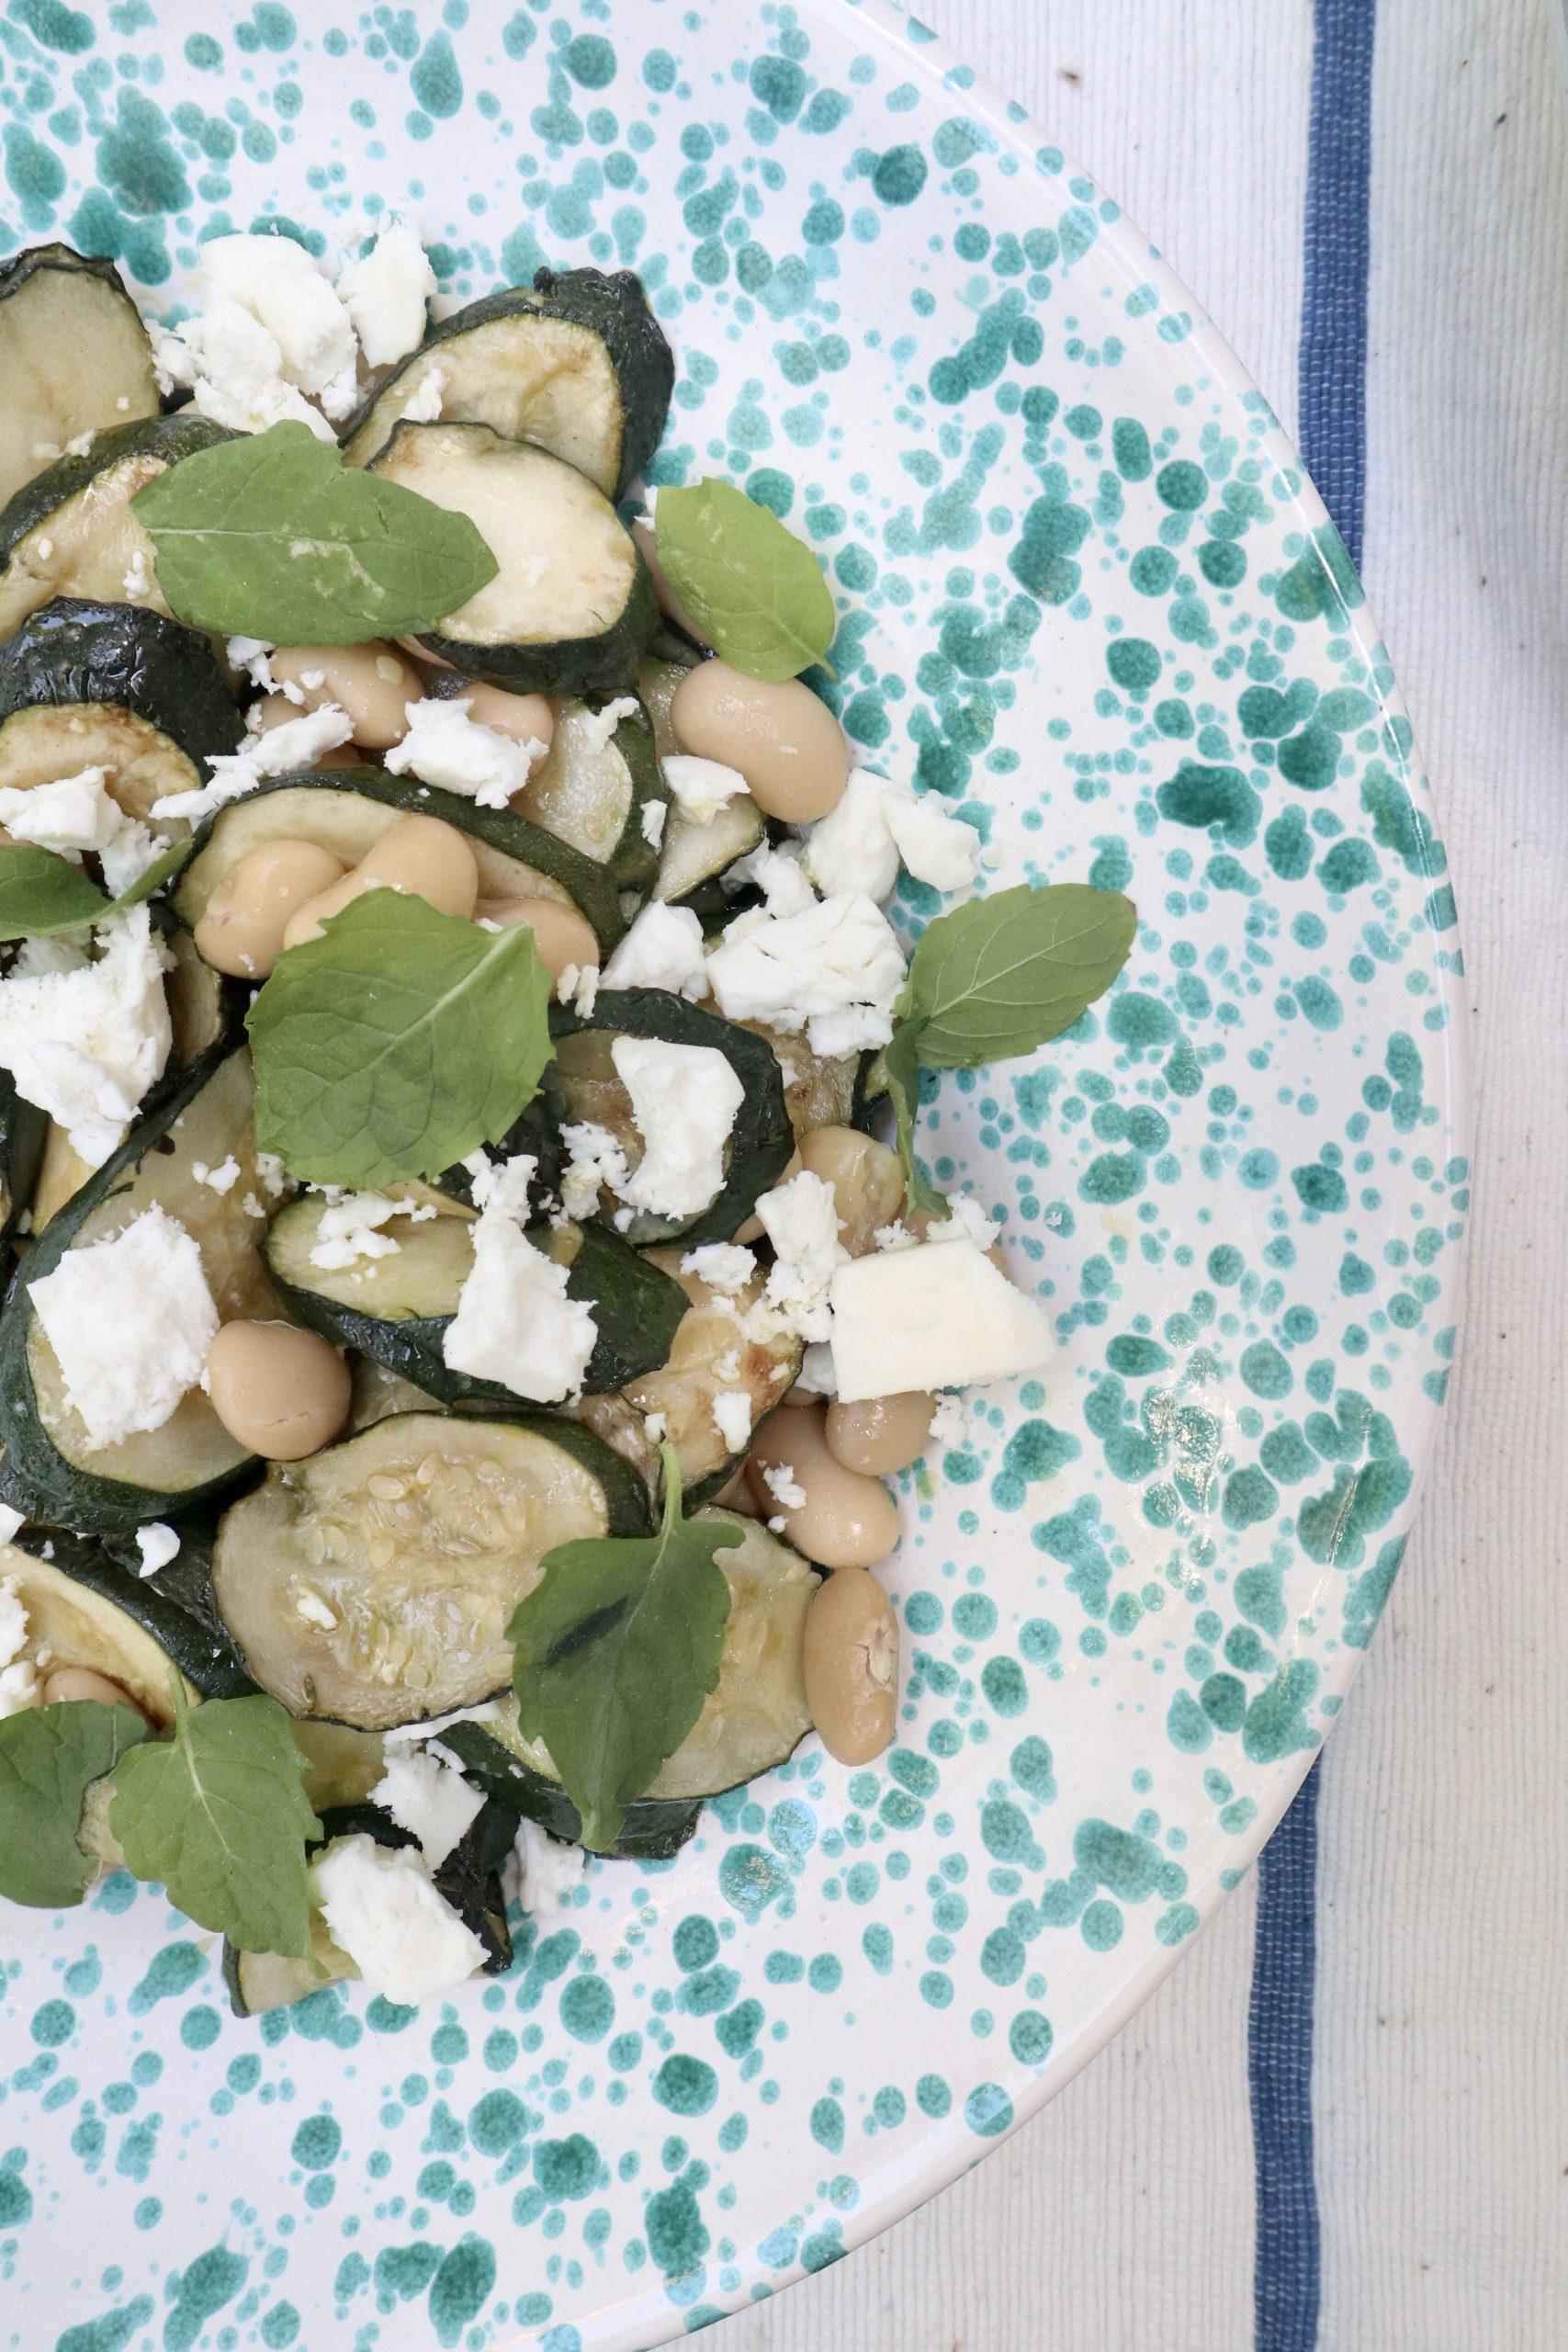 courgette salad corporate catering menu